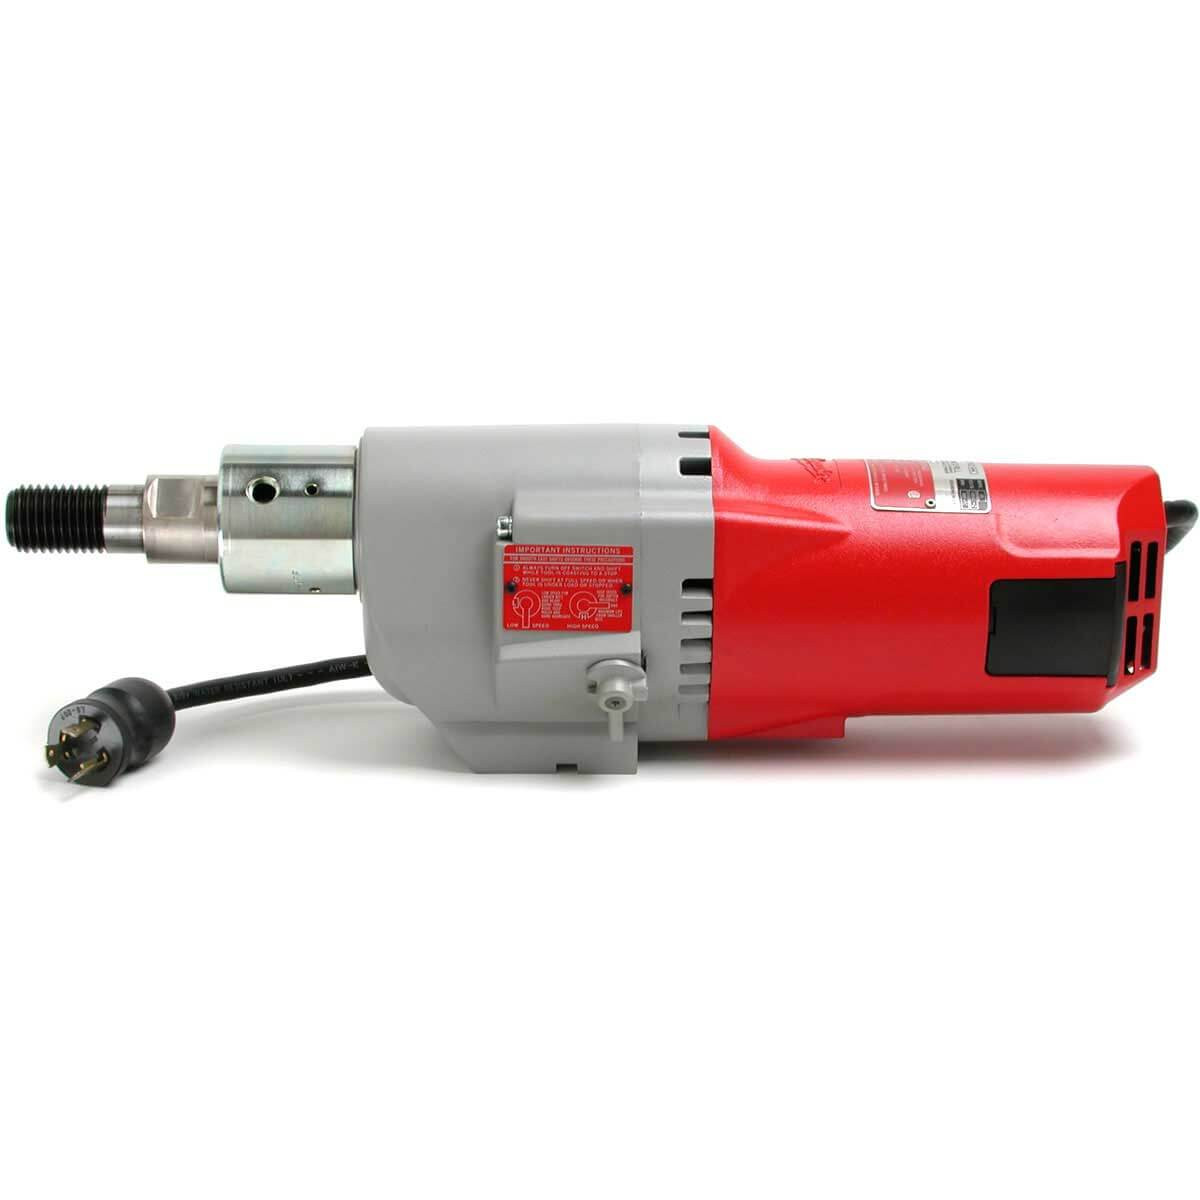 Milwaukee 4096 20 Amp Motor